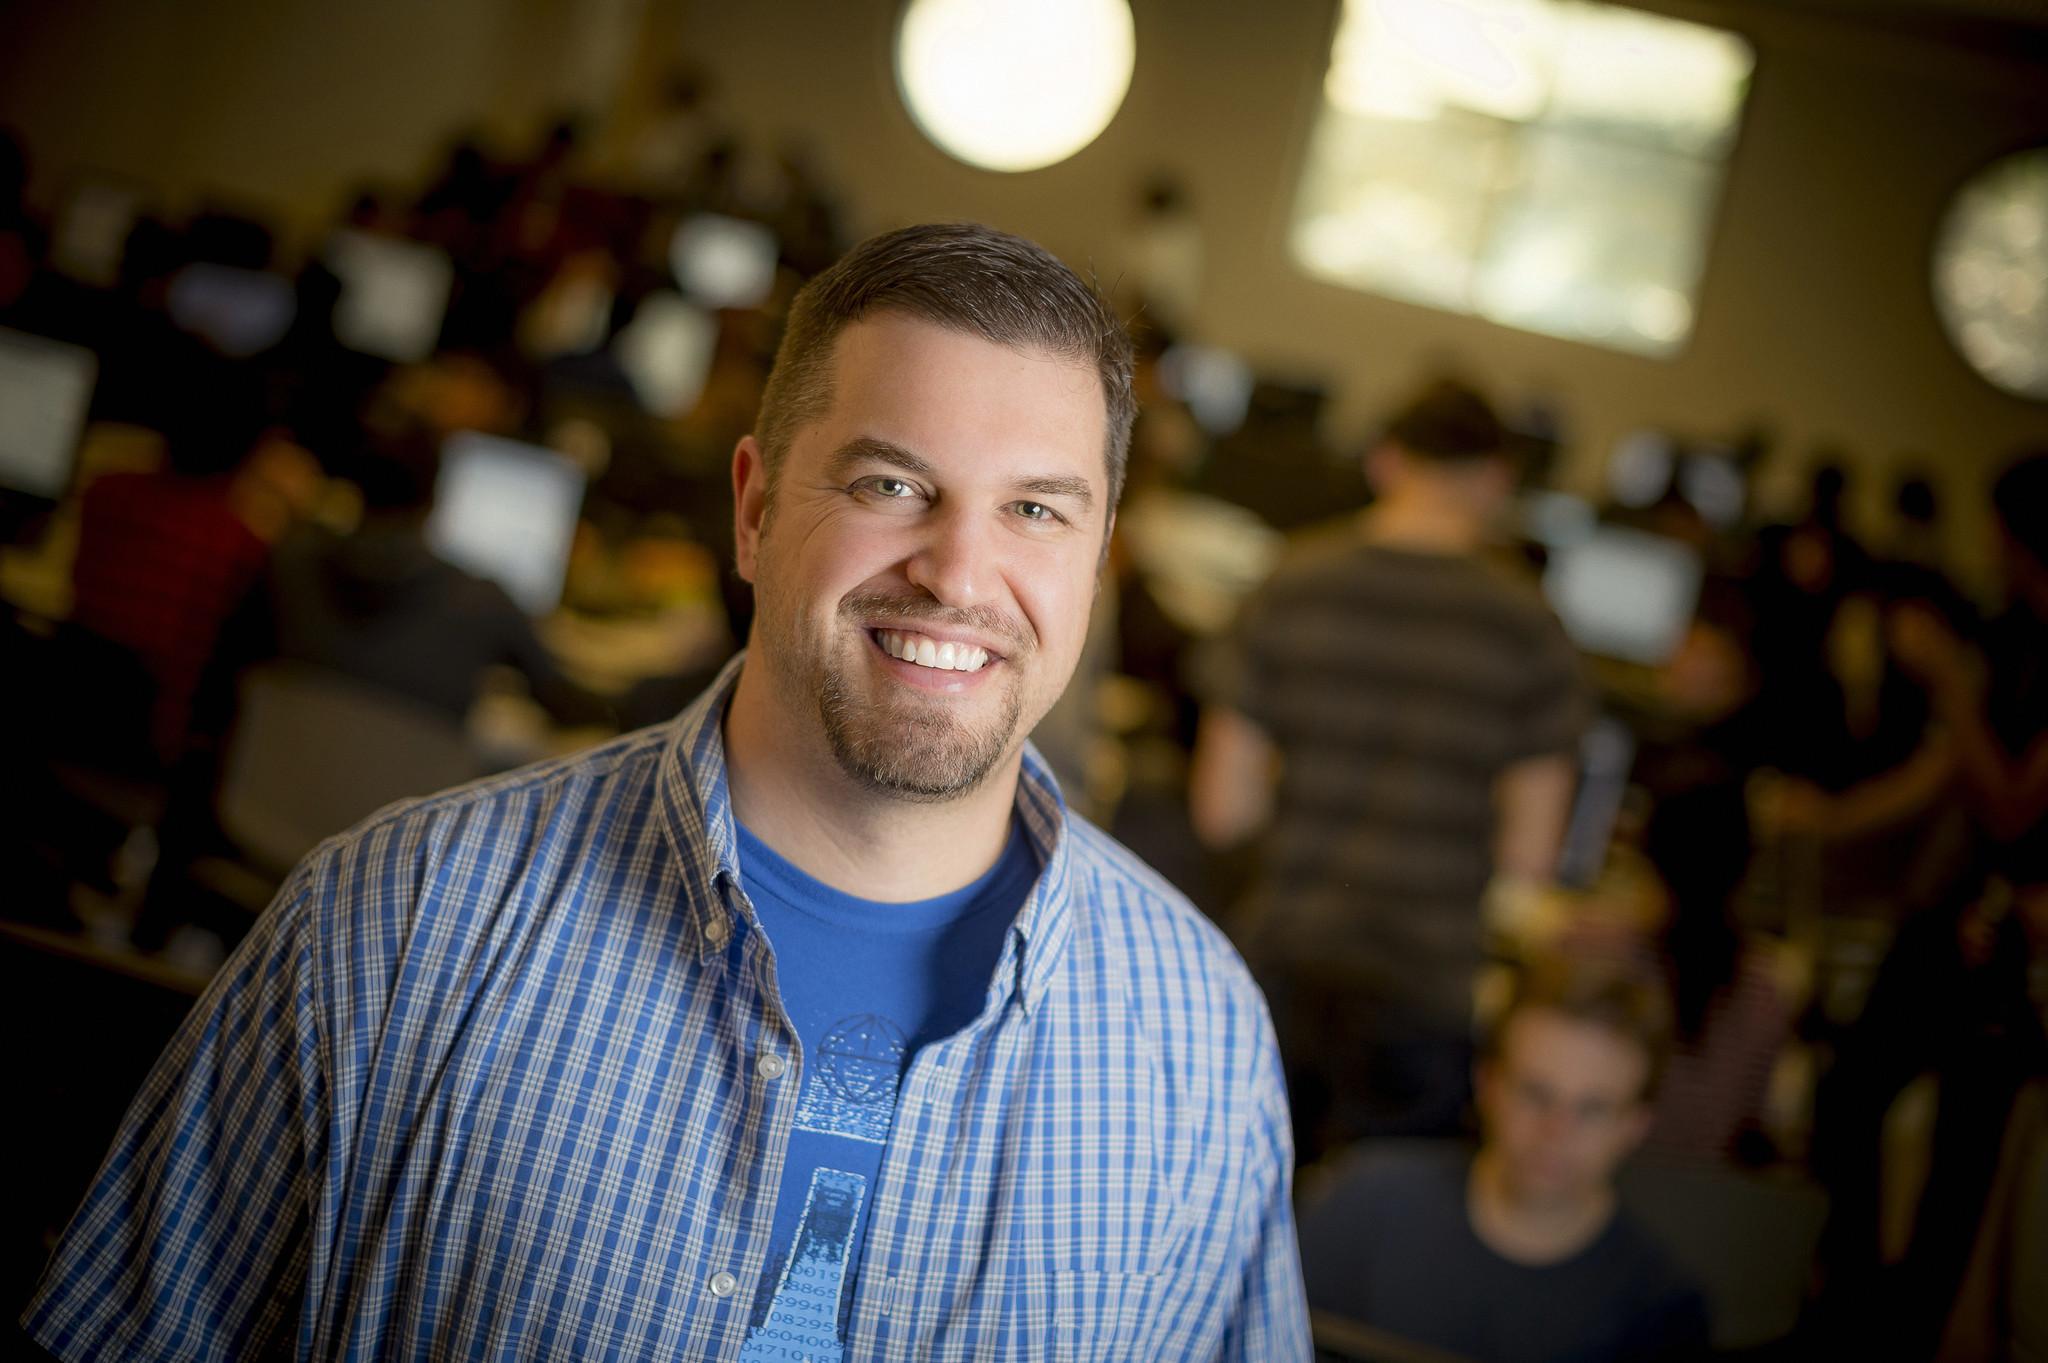 sandiegouniontribune.com - San Diego Union-Tribune - Facebook pioneer donates $75 million to UCSD for data science